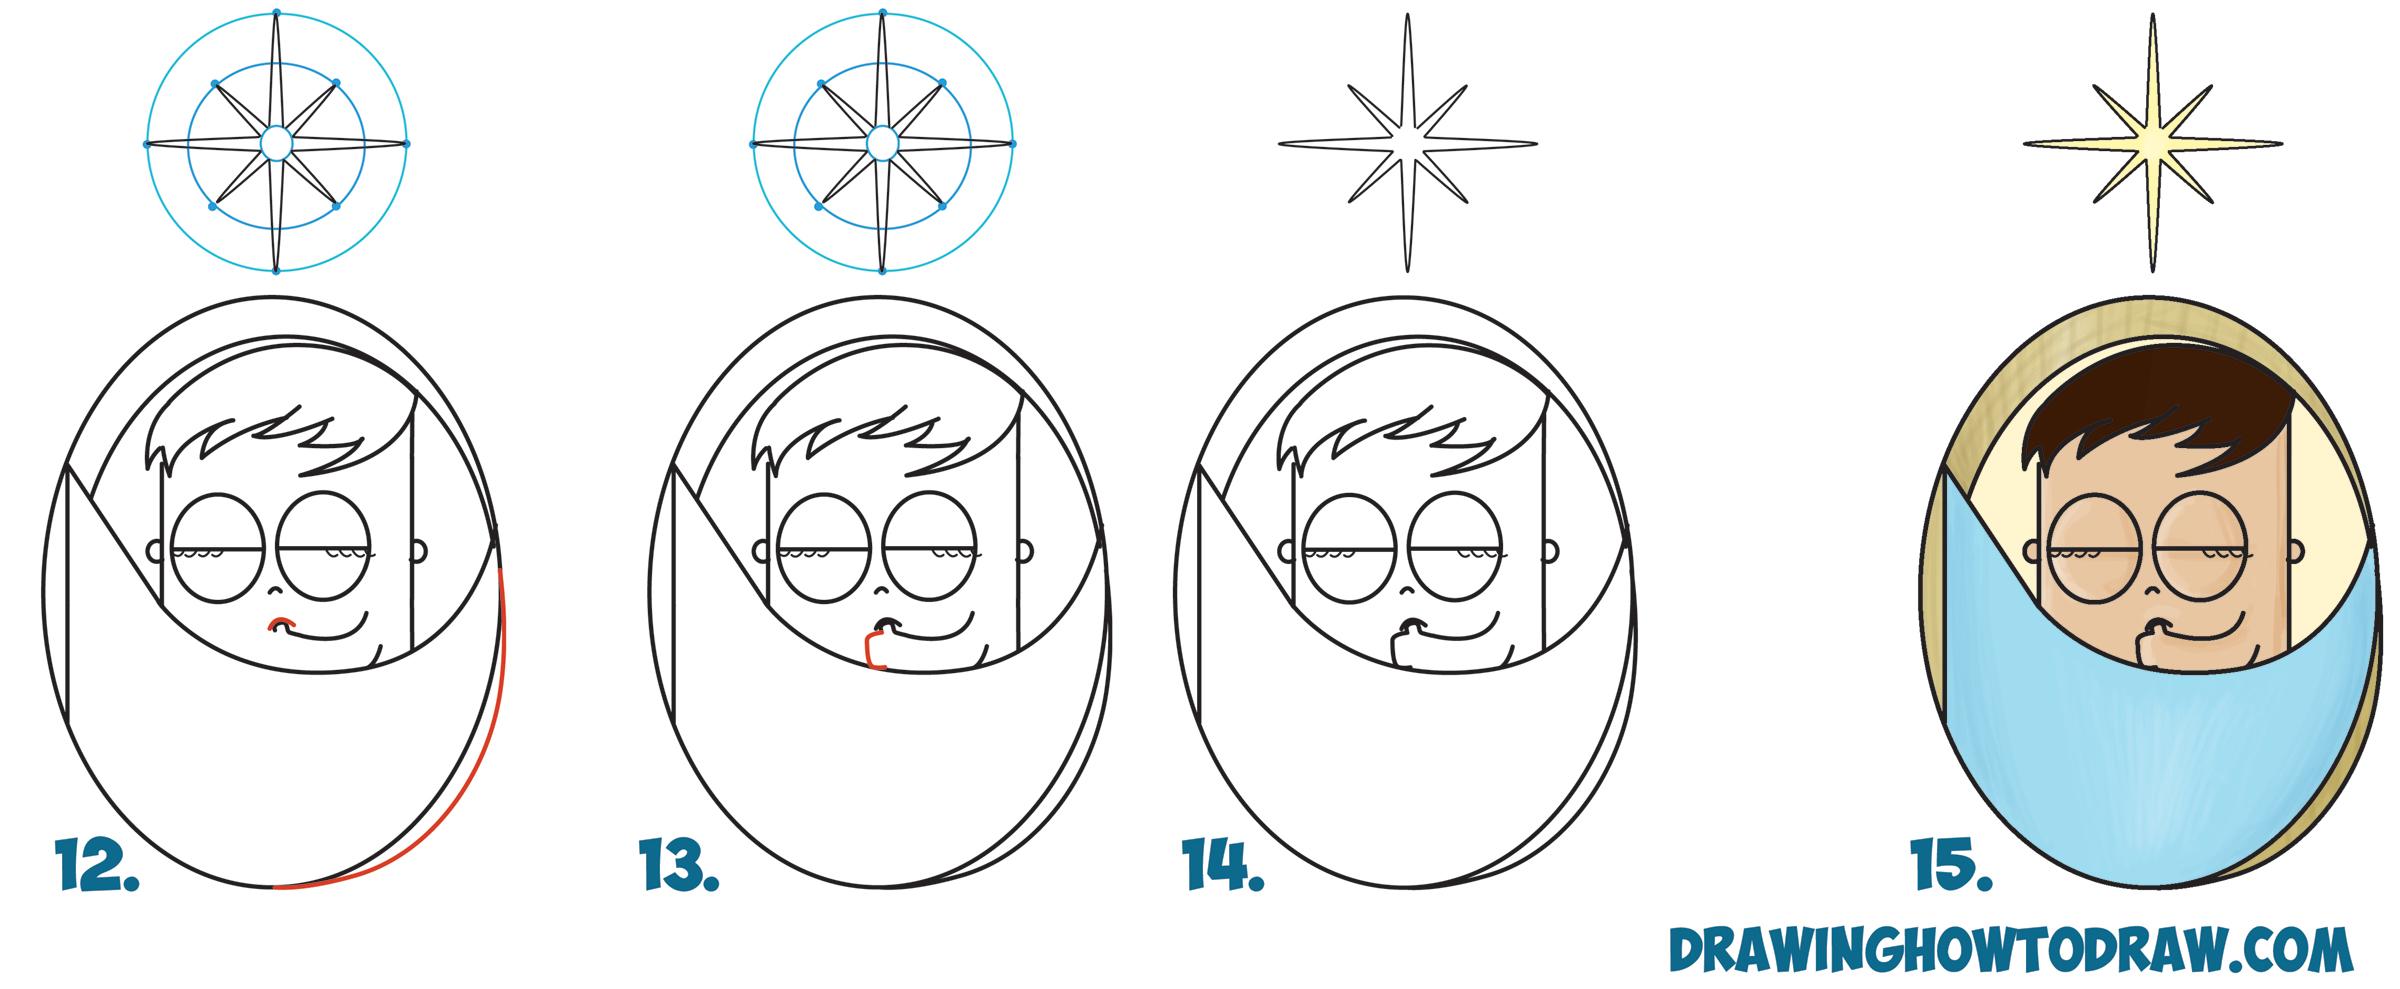 2400x989 How To Draw Cute Cartoon Baby Jesus Sleeping Under The North Star